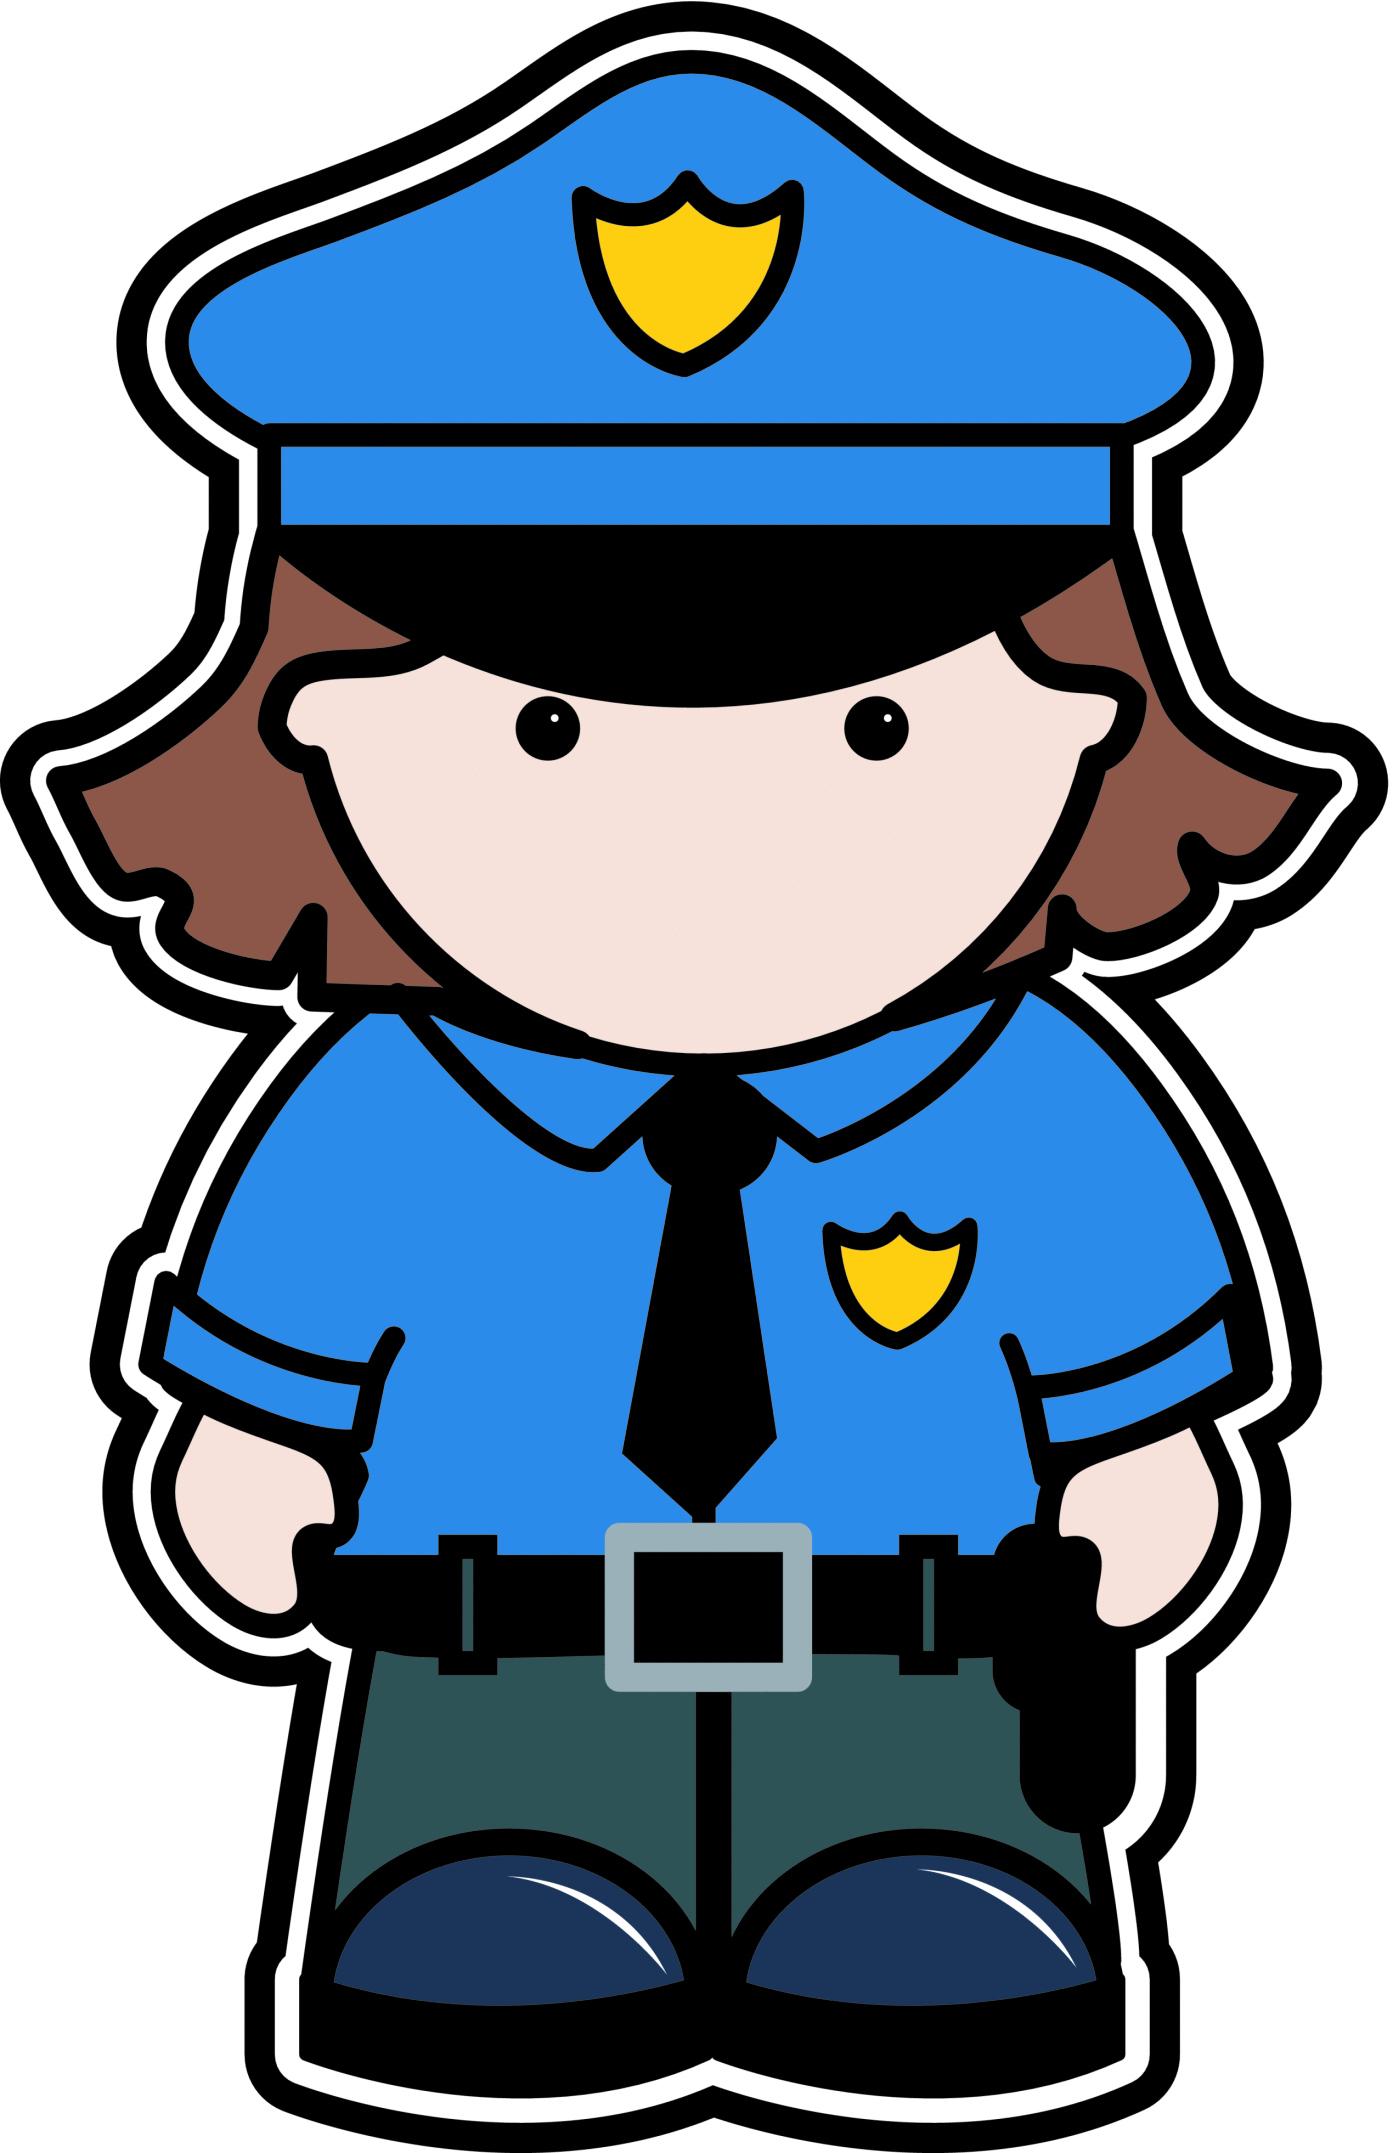 Clip art police clipart image 1